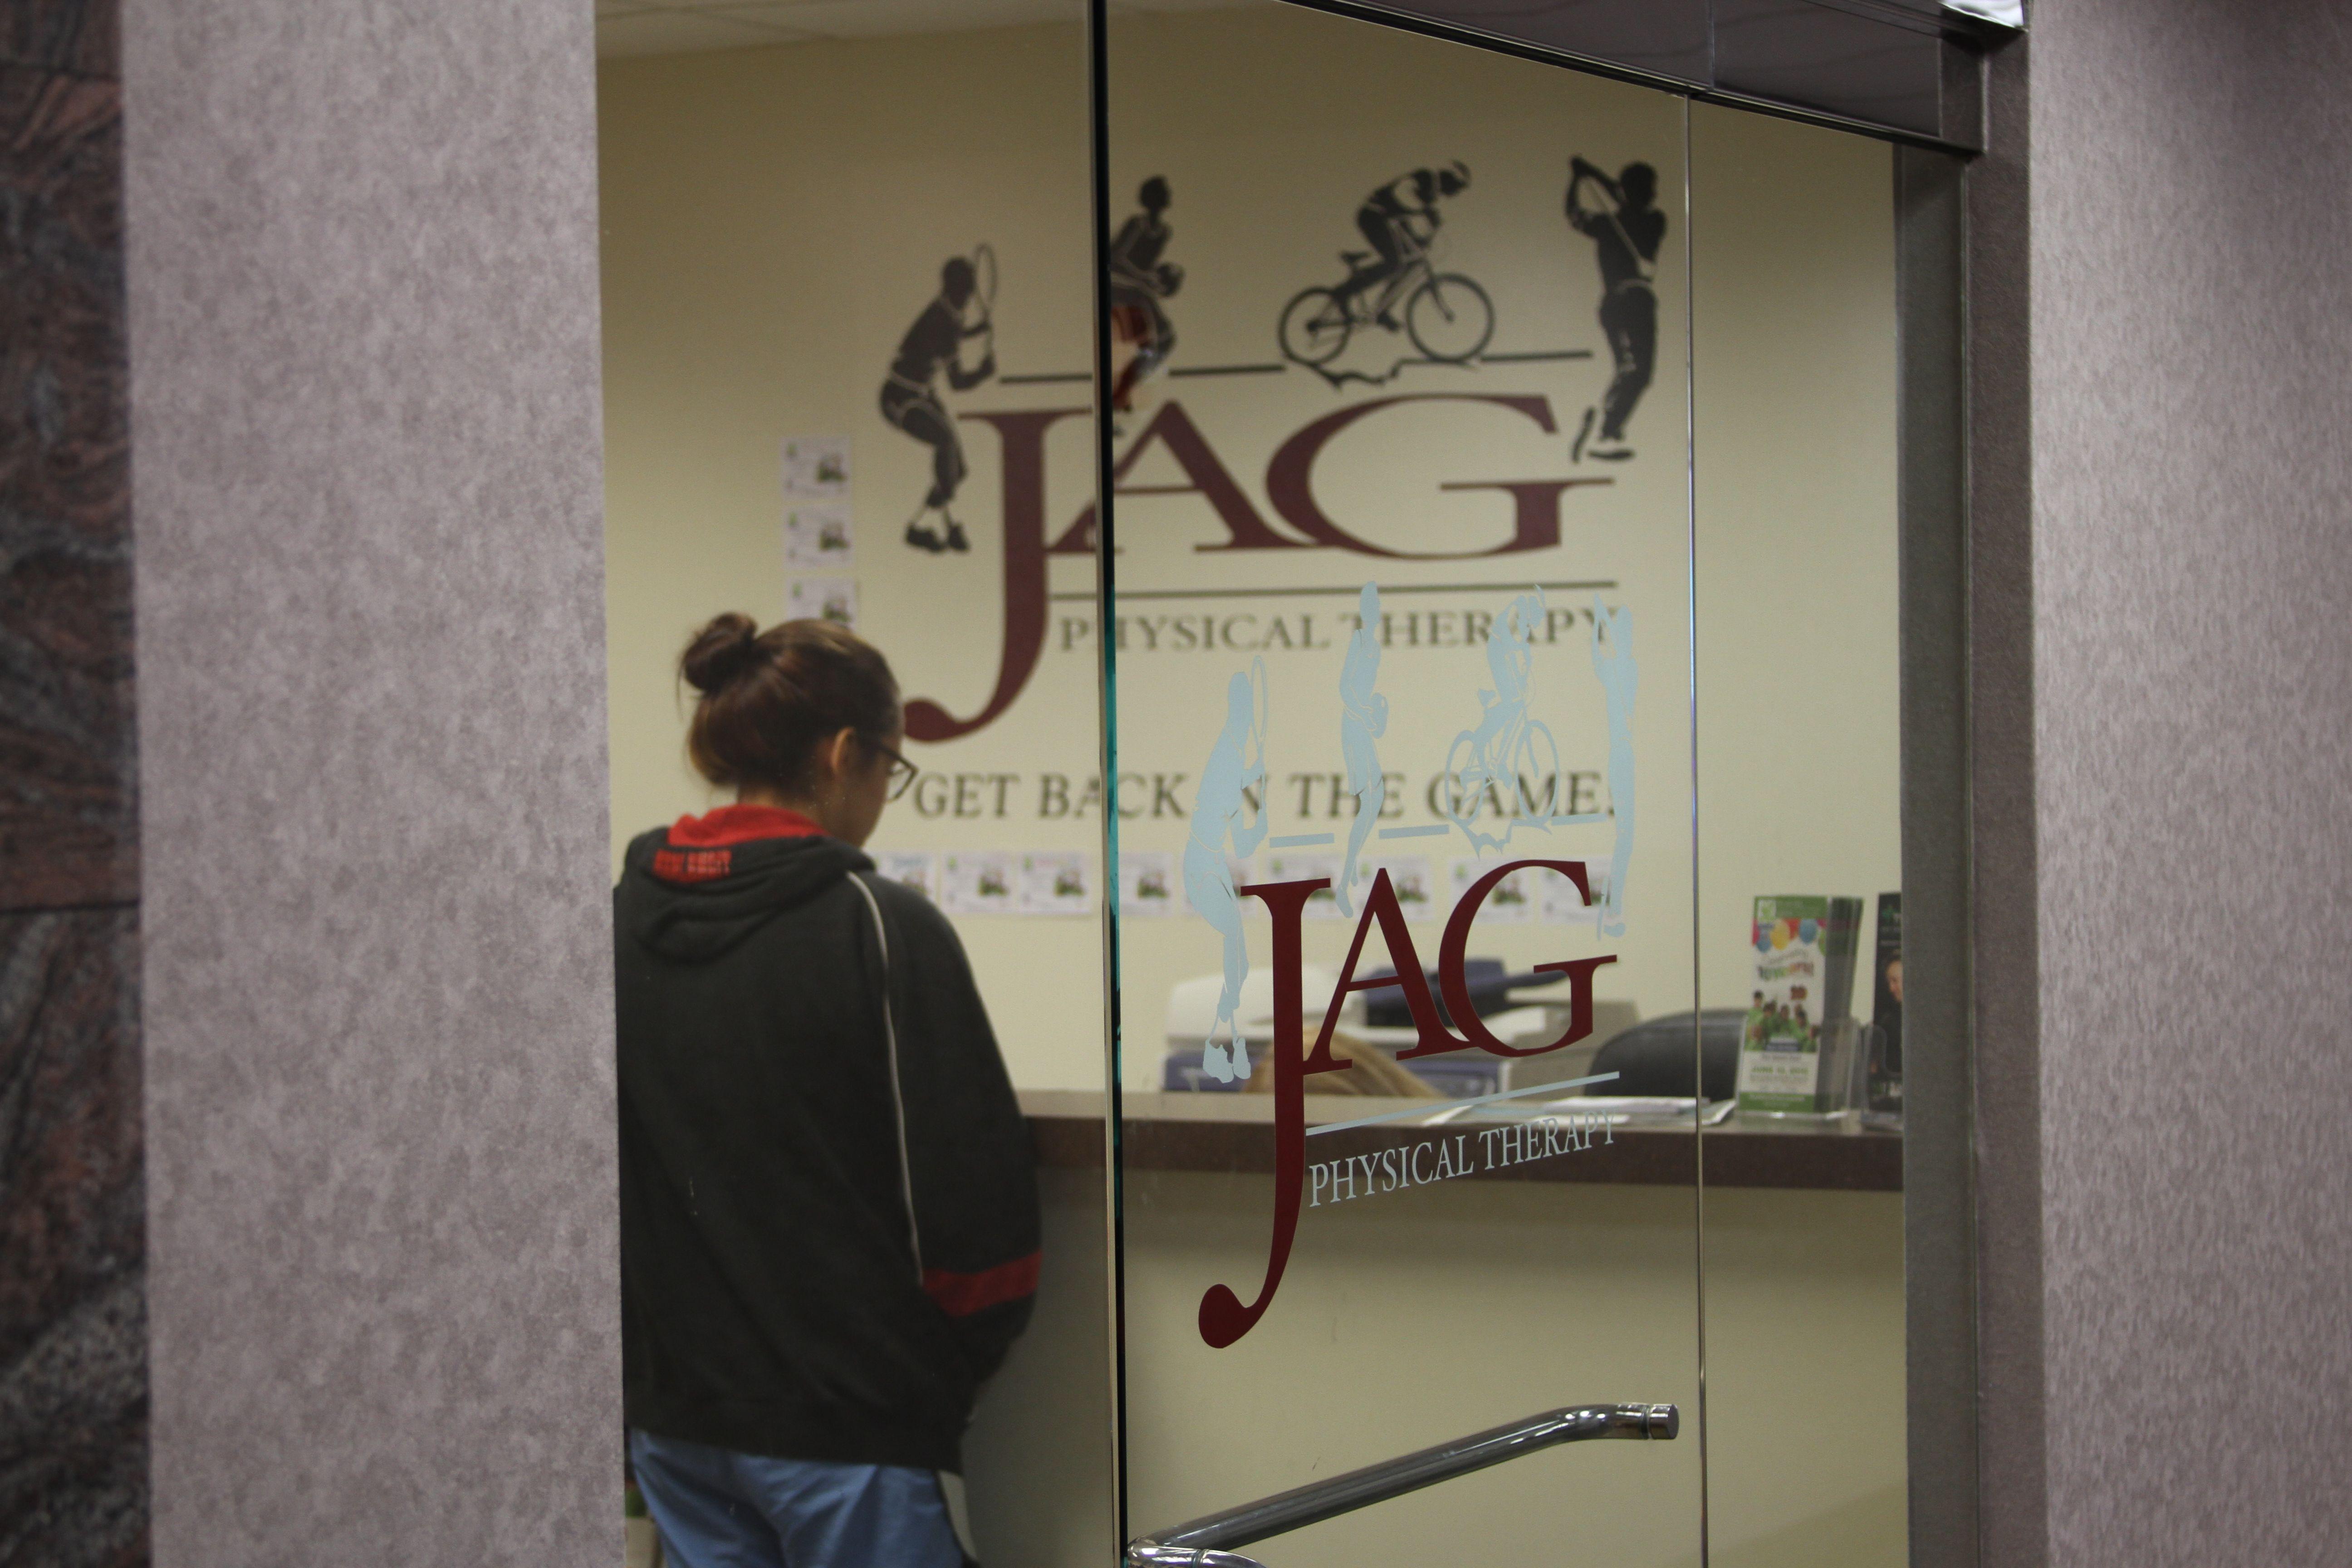 Entrance to JAG Suite